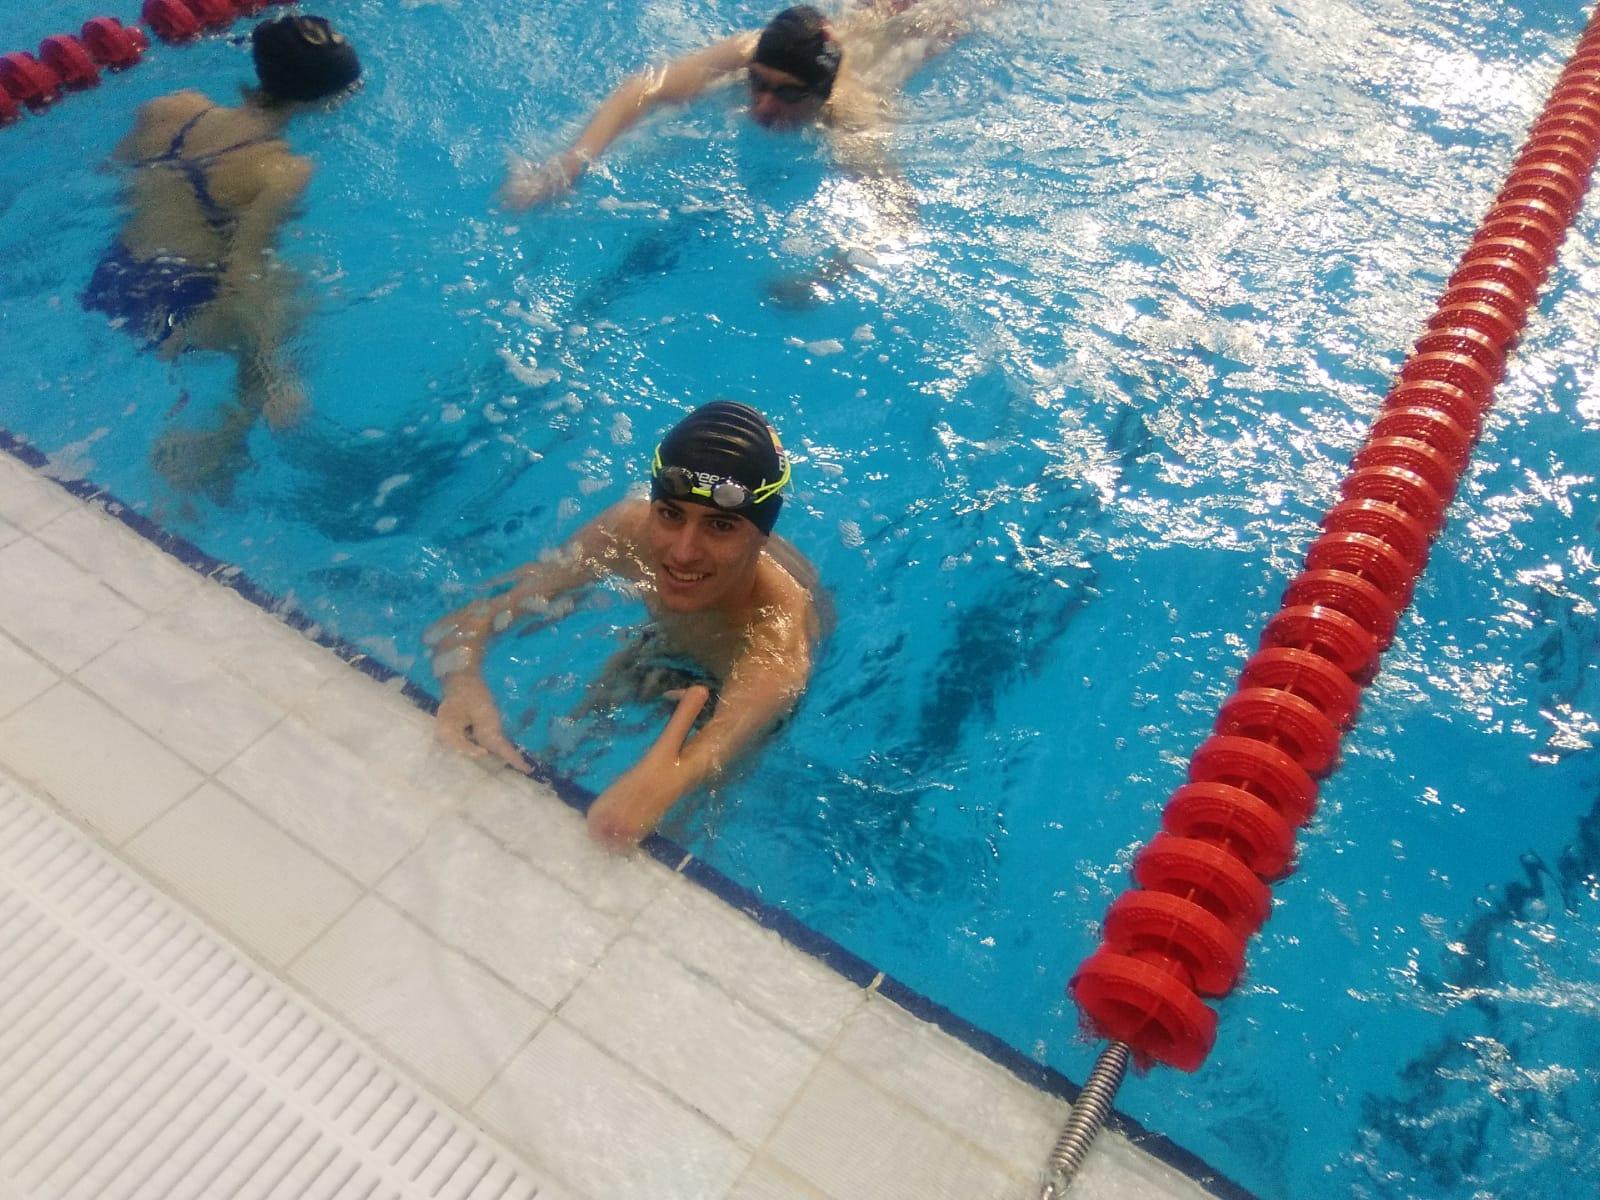 Luis Huerta, en la piscina de Dublín. / FEDEACYL